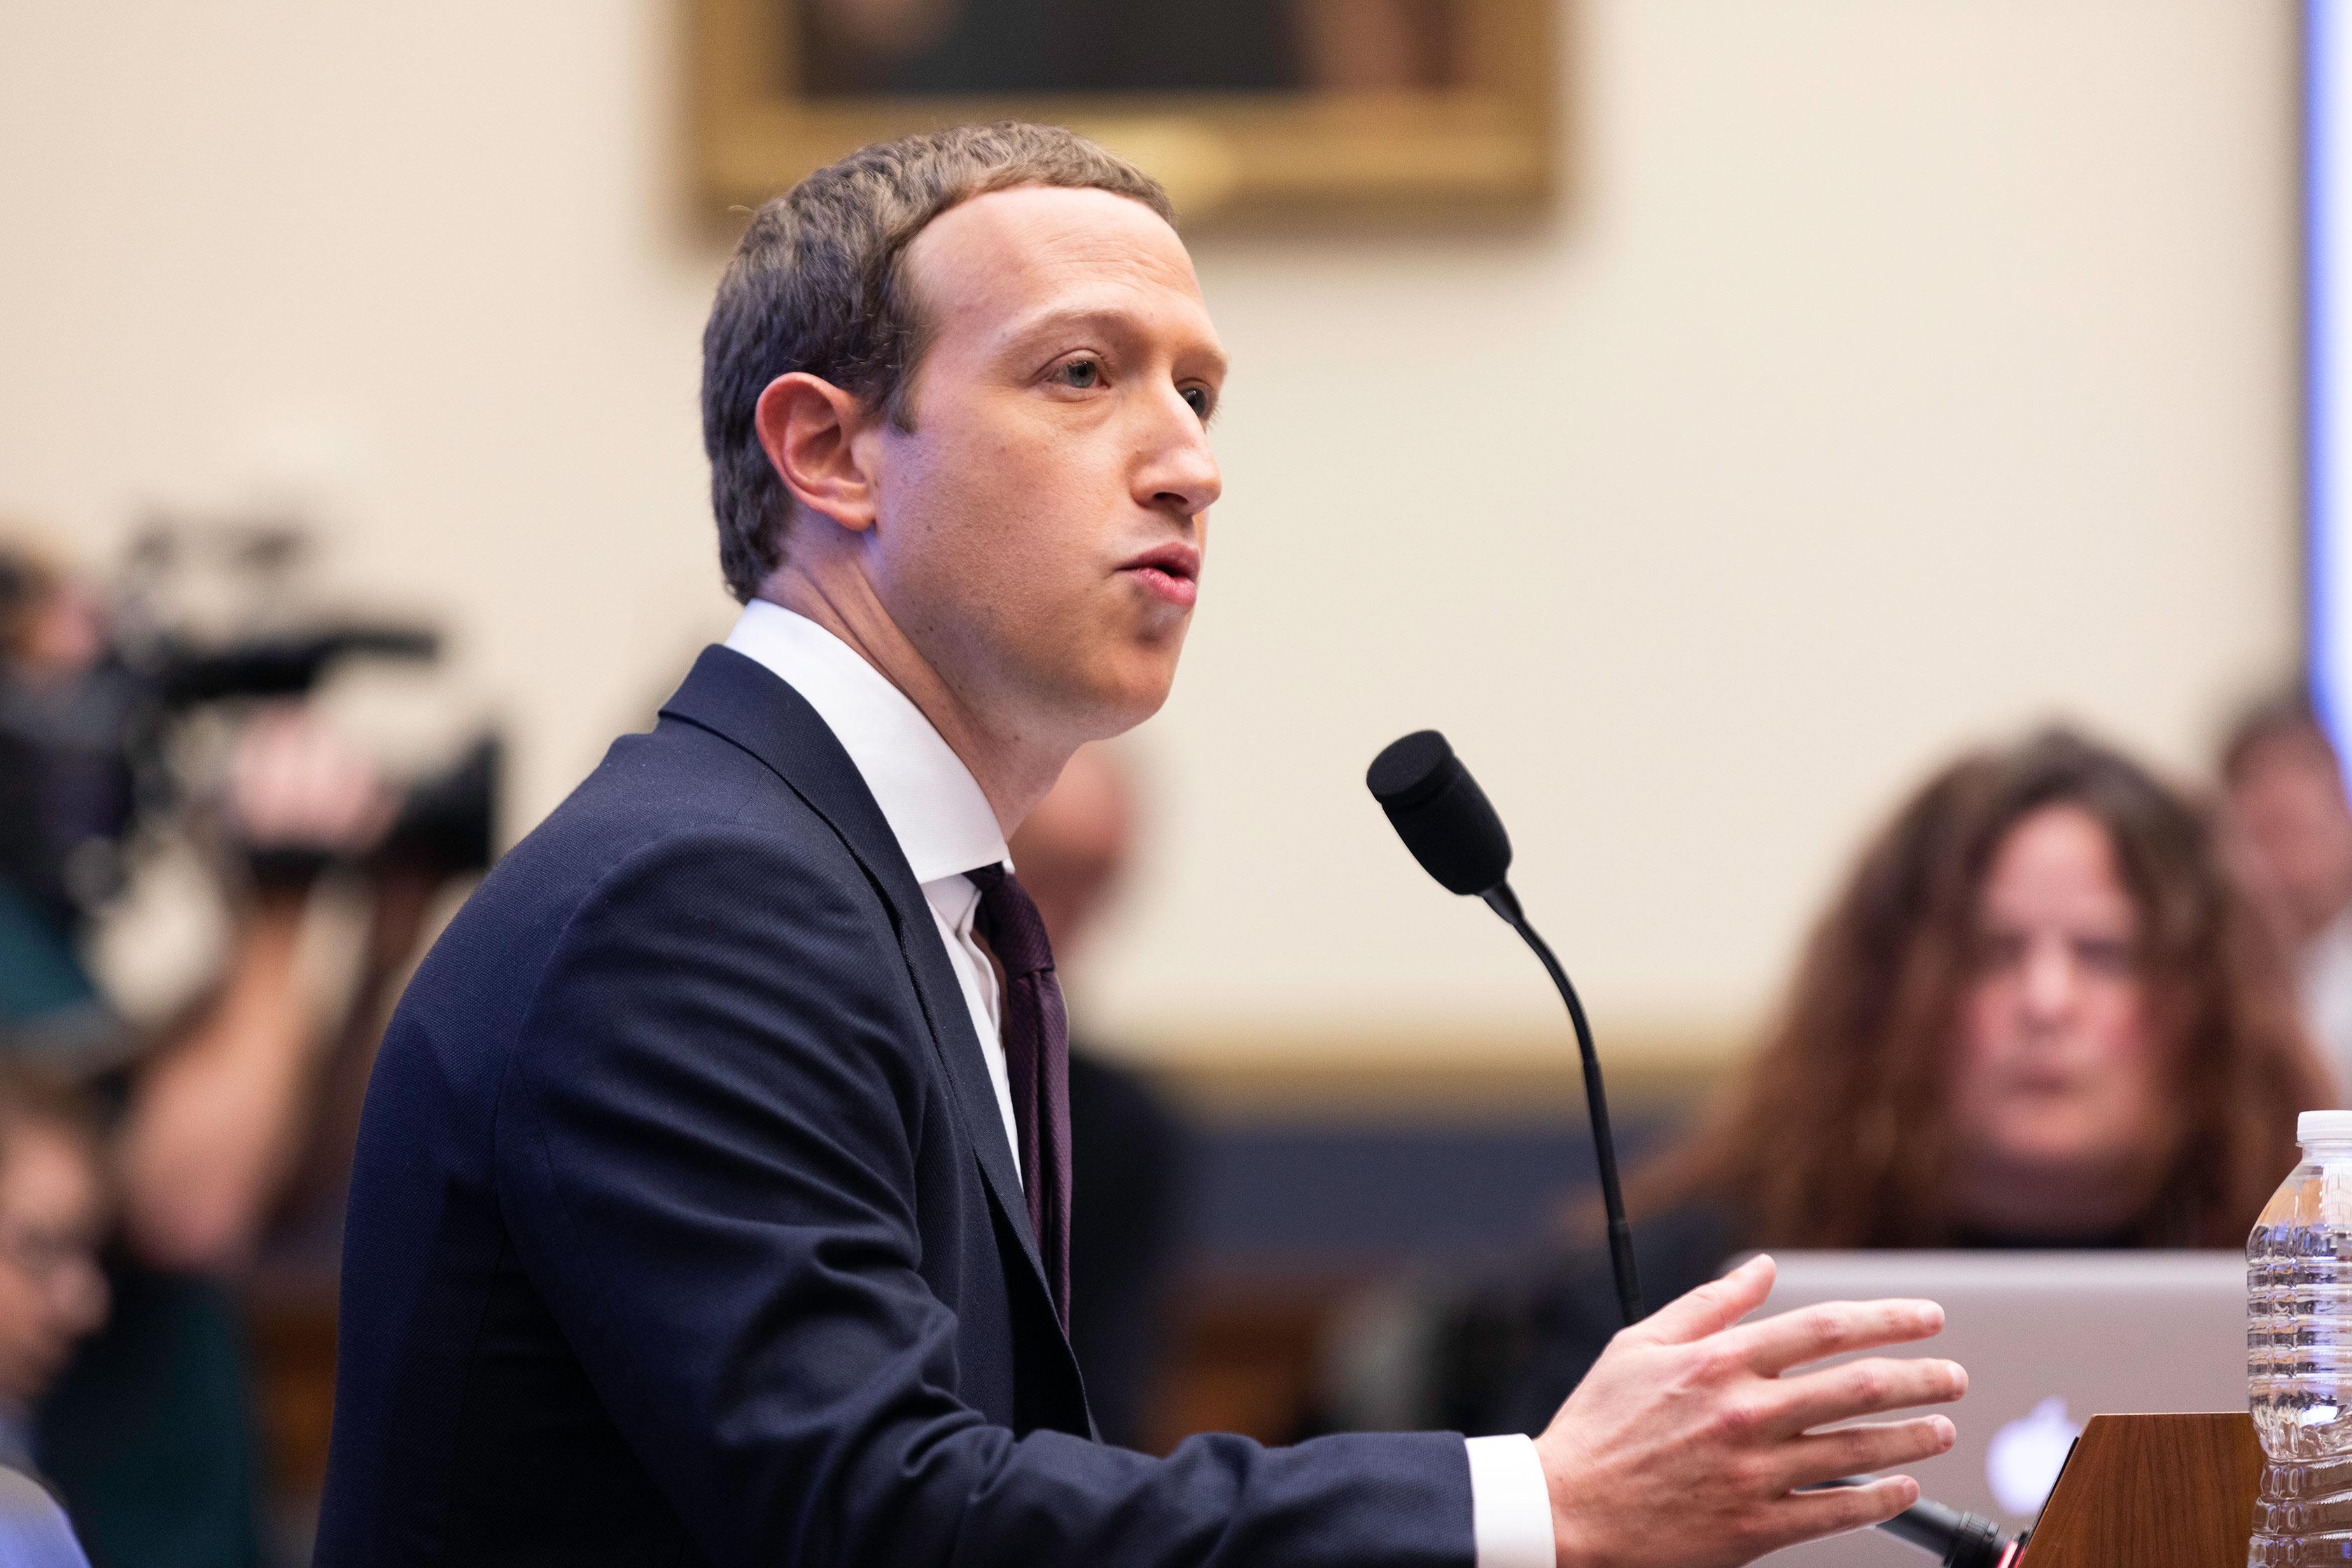 Mark Zuckerberg Hearing In Congress